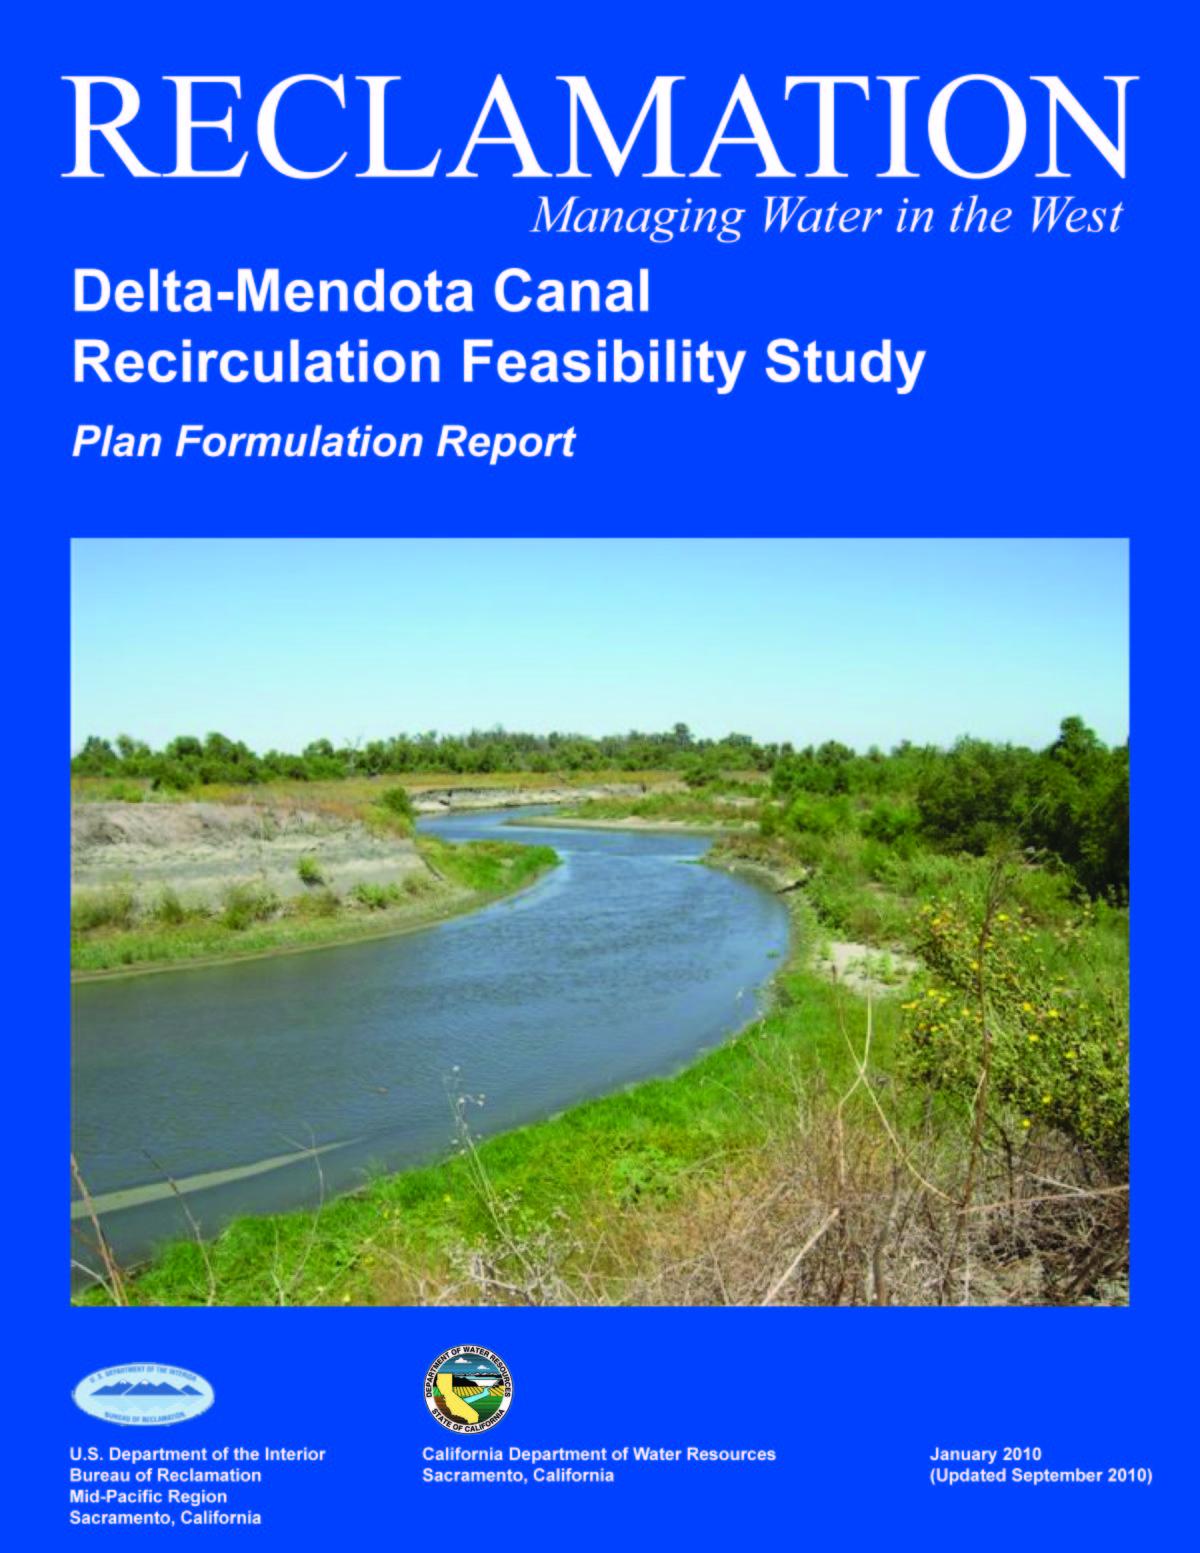 Delta-Mendota Canal Recirculation Feasibility Study Plan Formulation Report